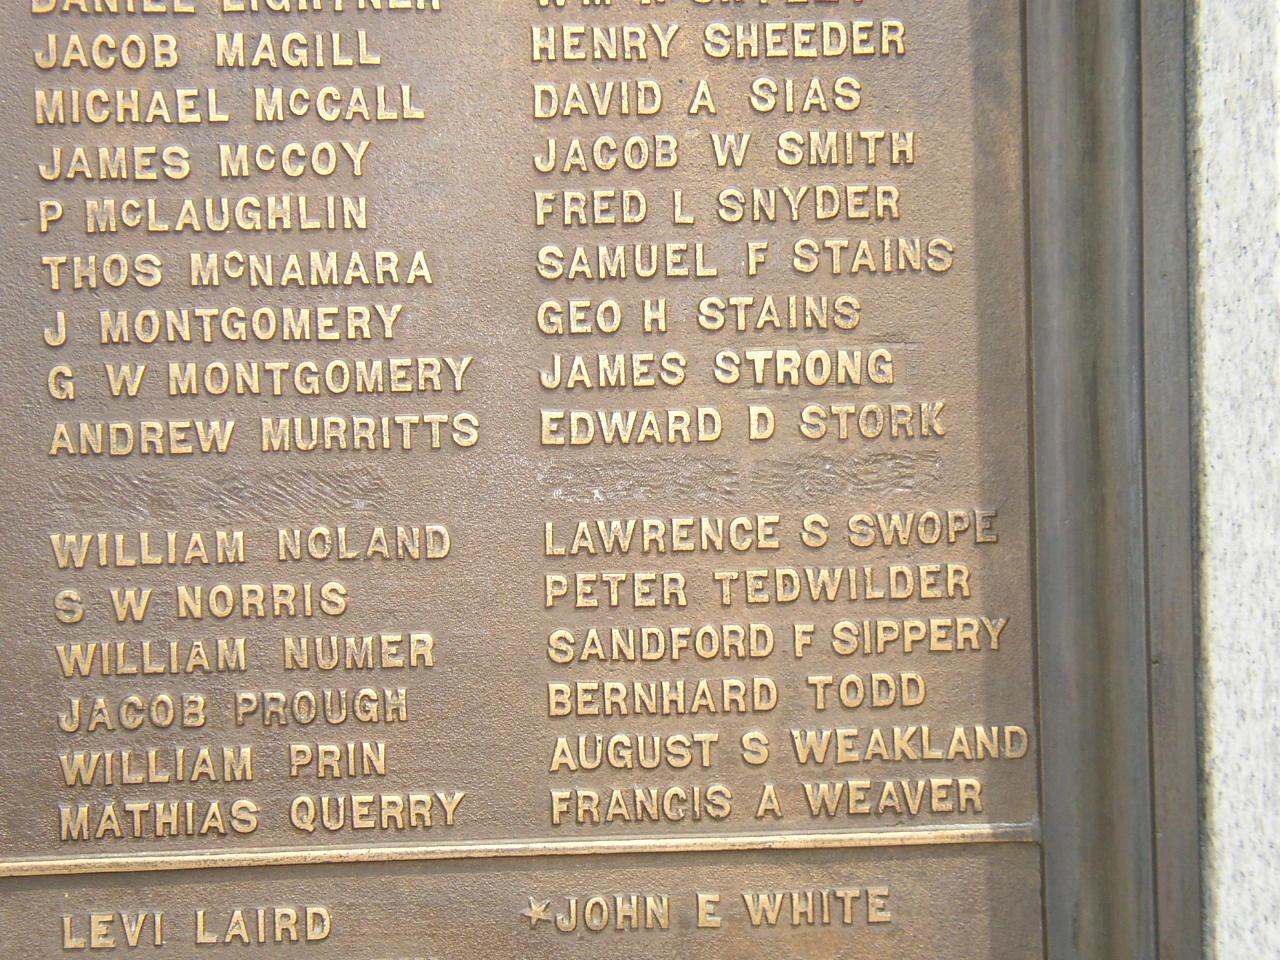 PA Monument @ Gettysburg